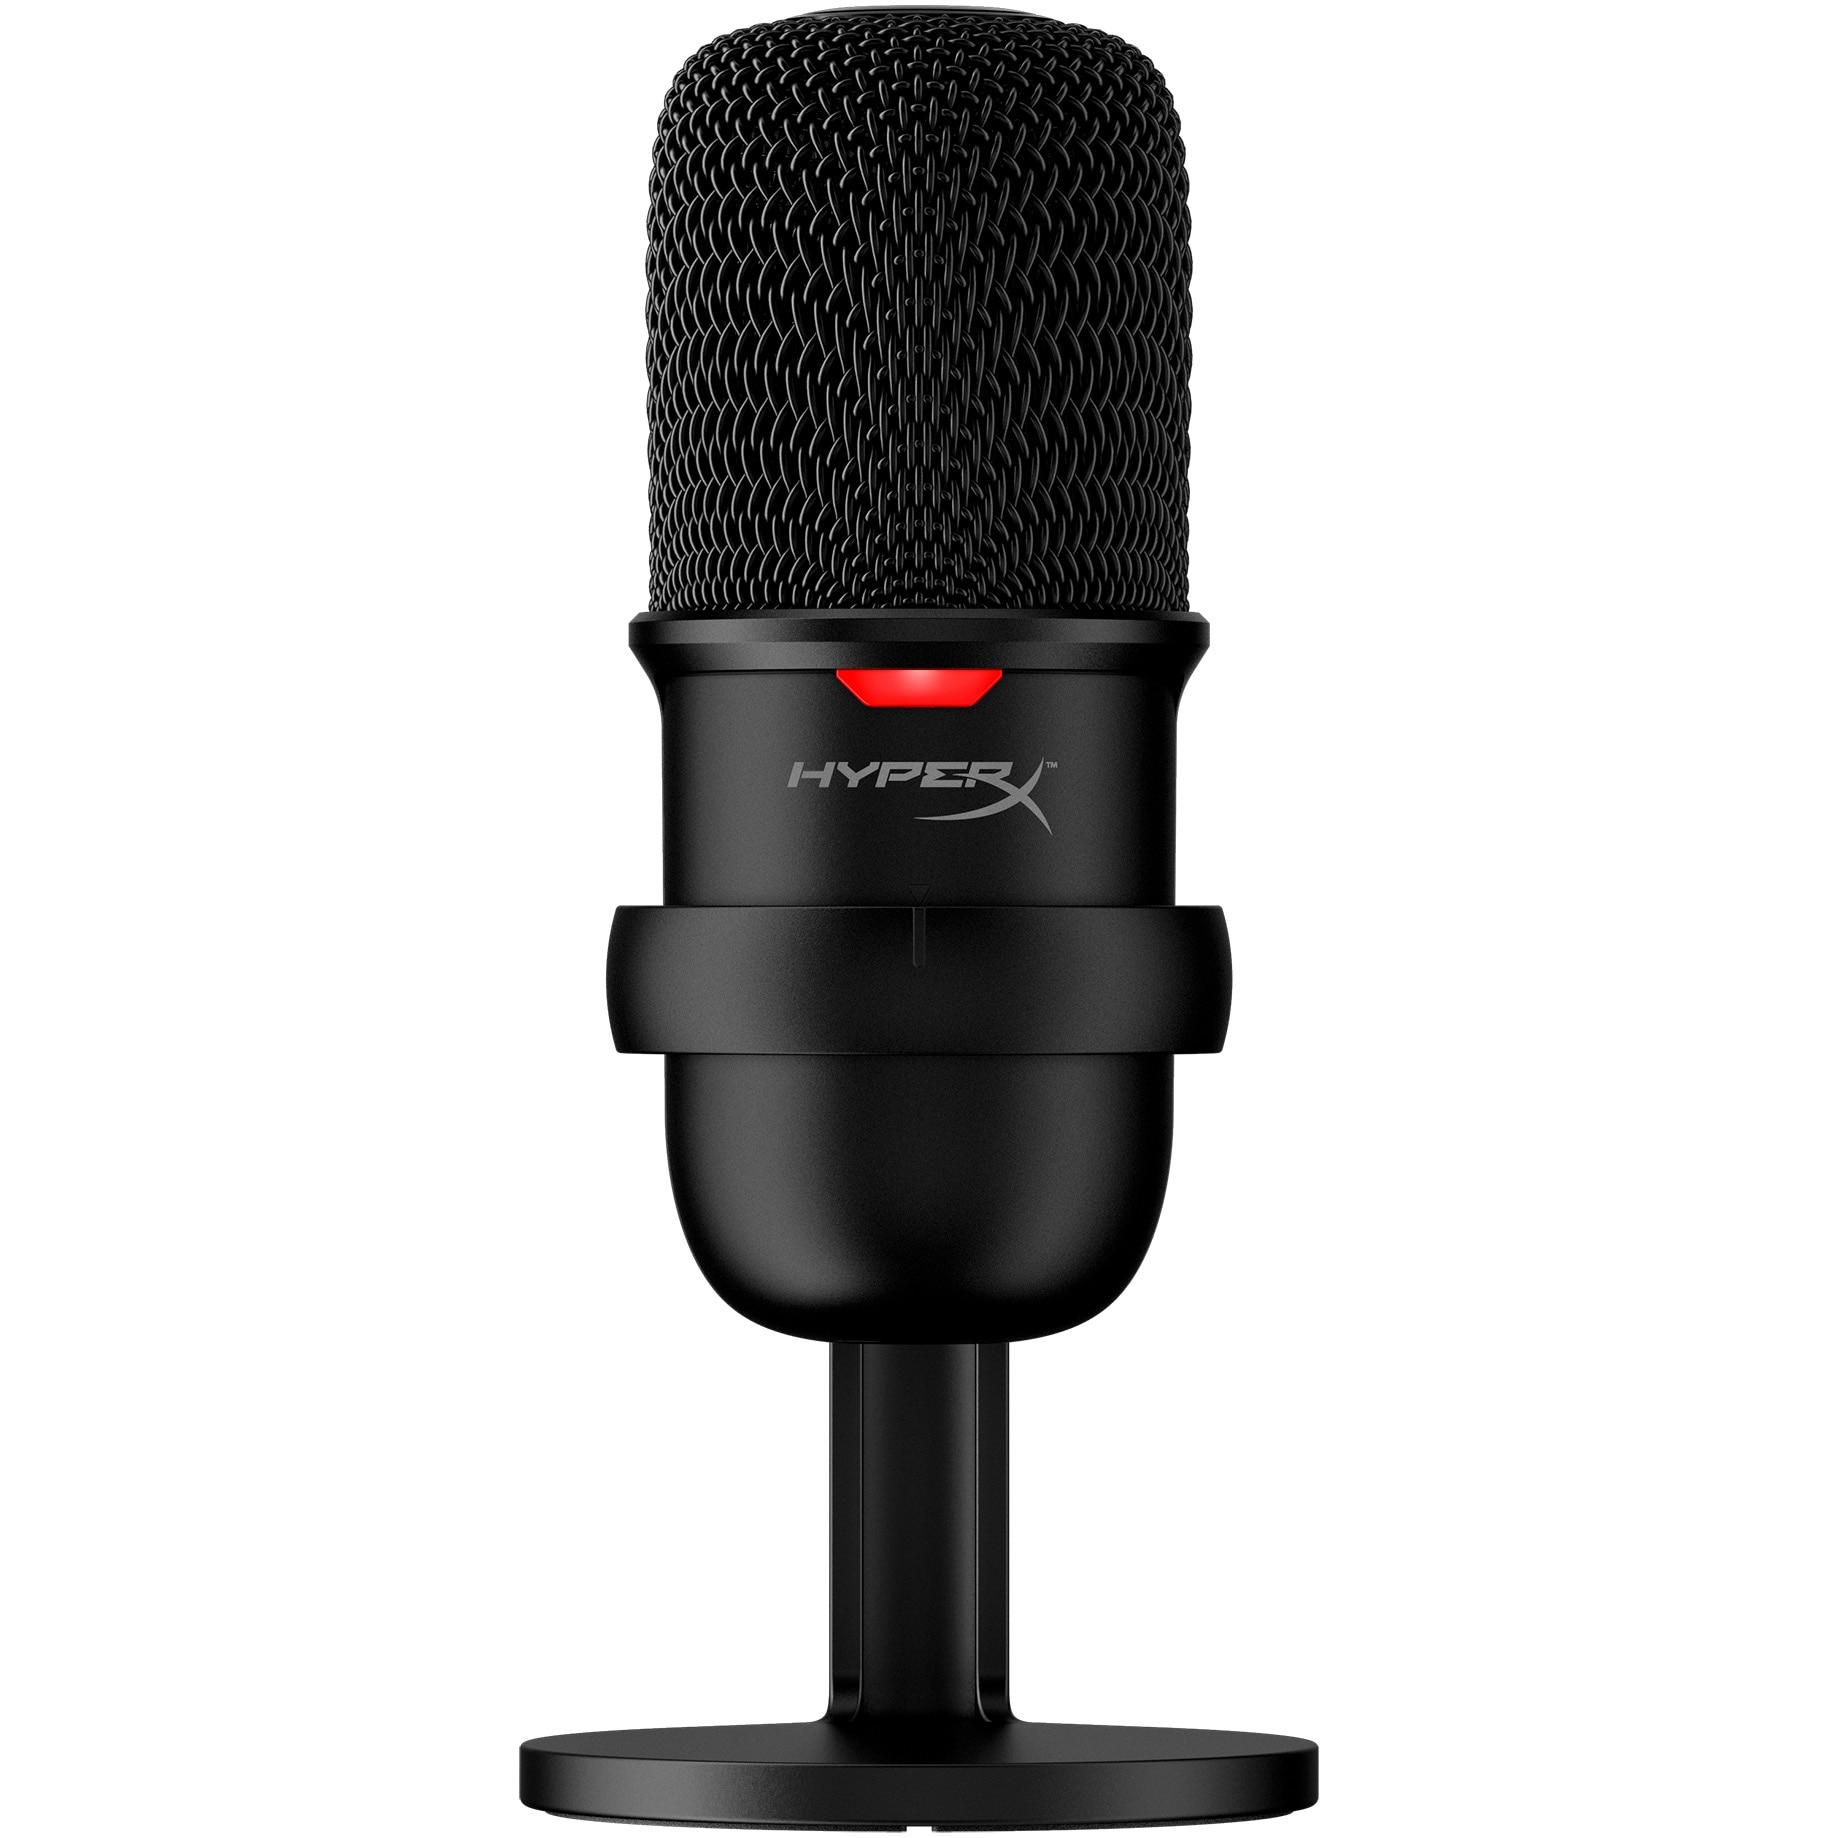 Fotografie Microfon HyperX SoloCast, cardioid, USB, Negru